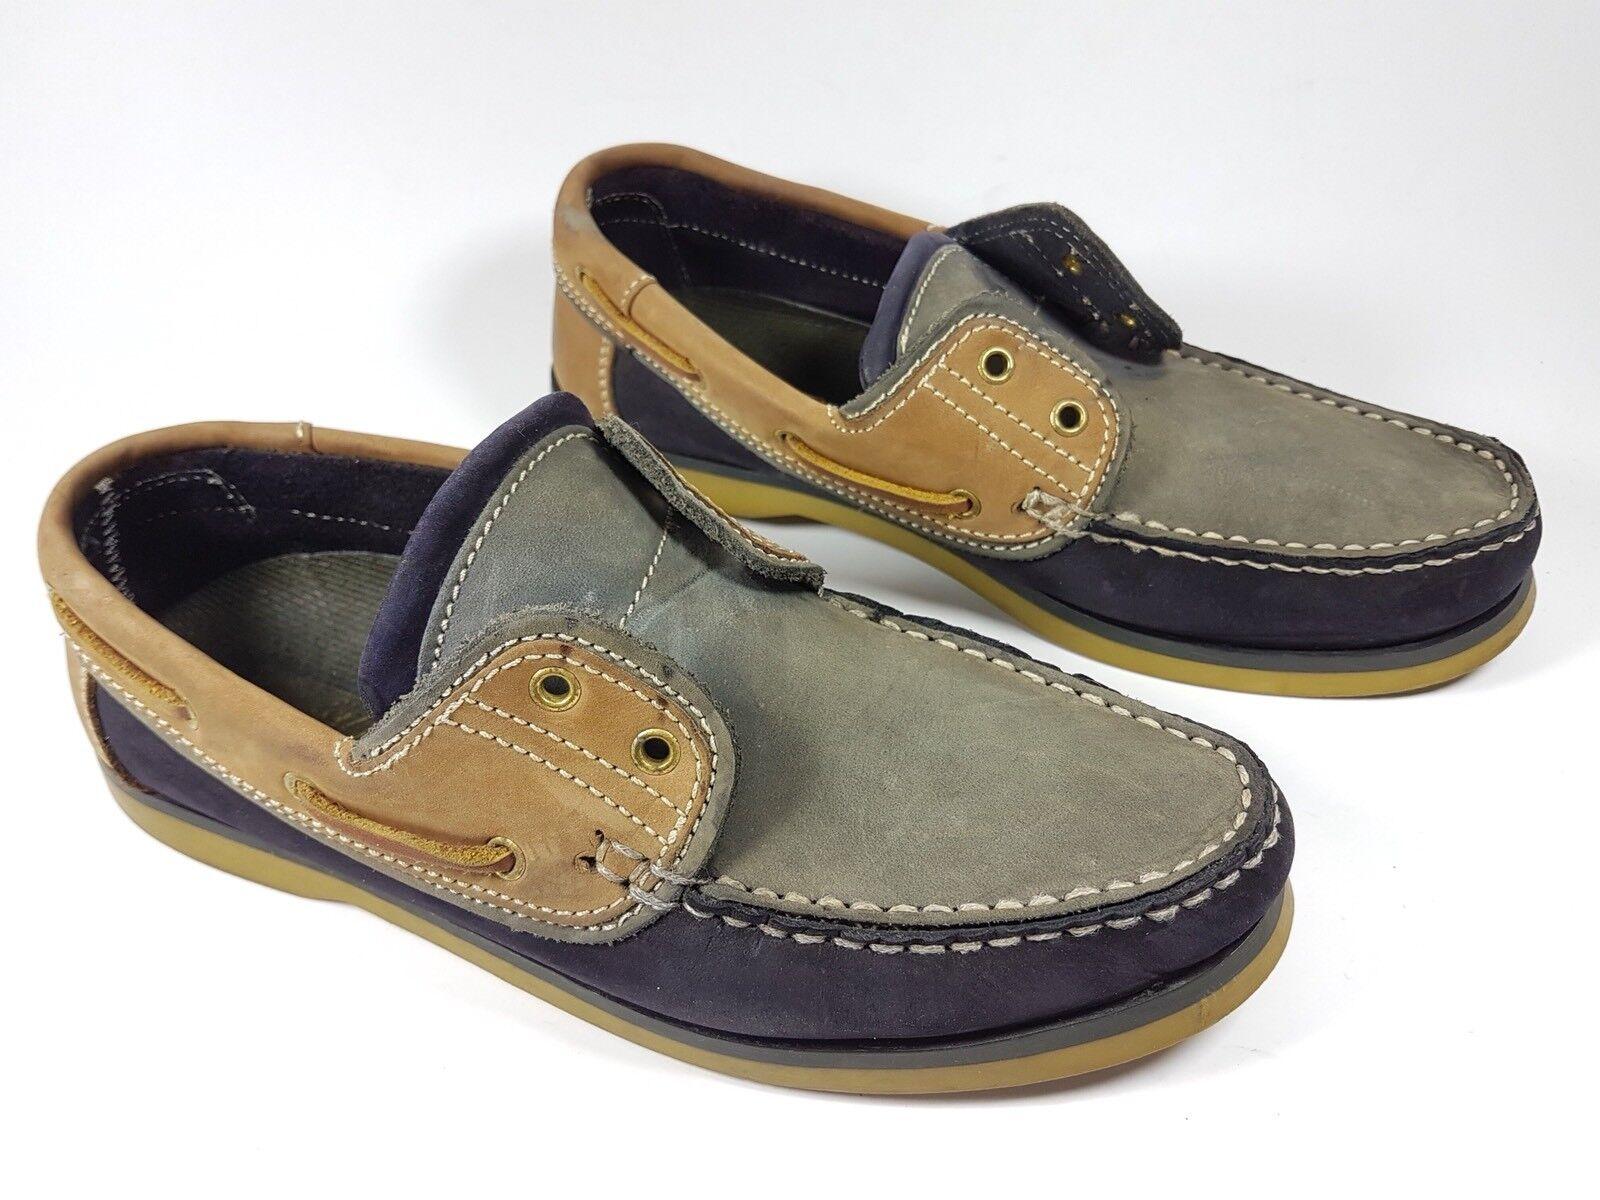 Multi tone leather 'comfy fit' 40 boat shoes eu 40 fit' d5ad43